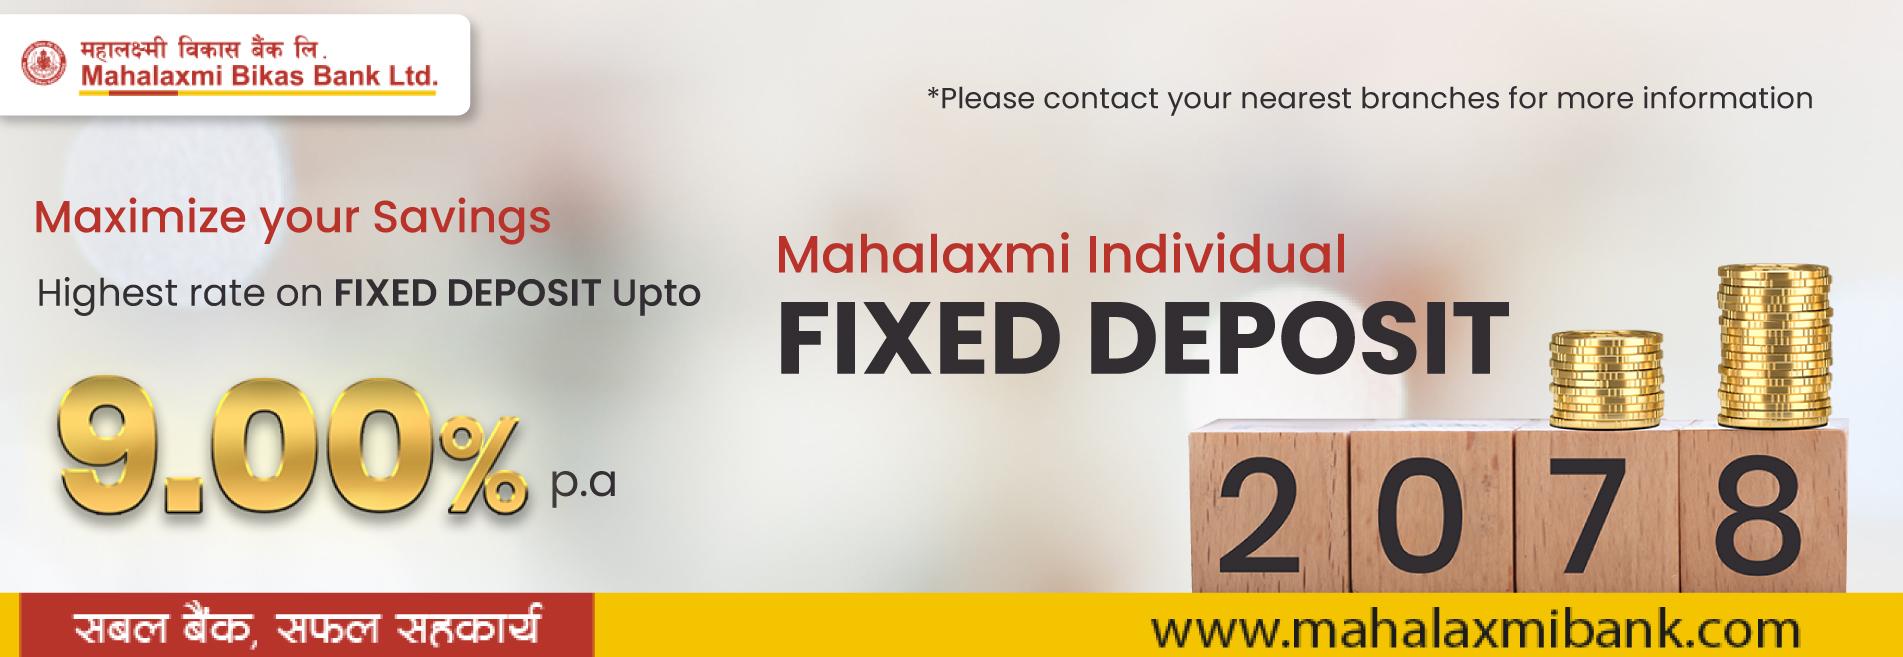 Mahalaxmi Fixed Deposit Accounts